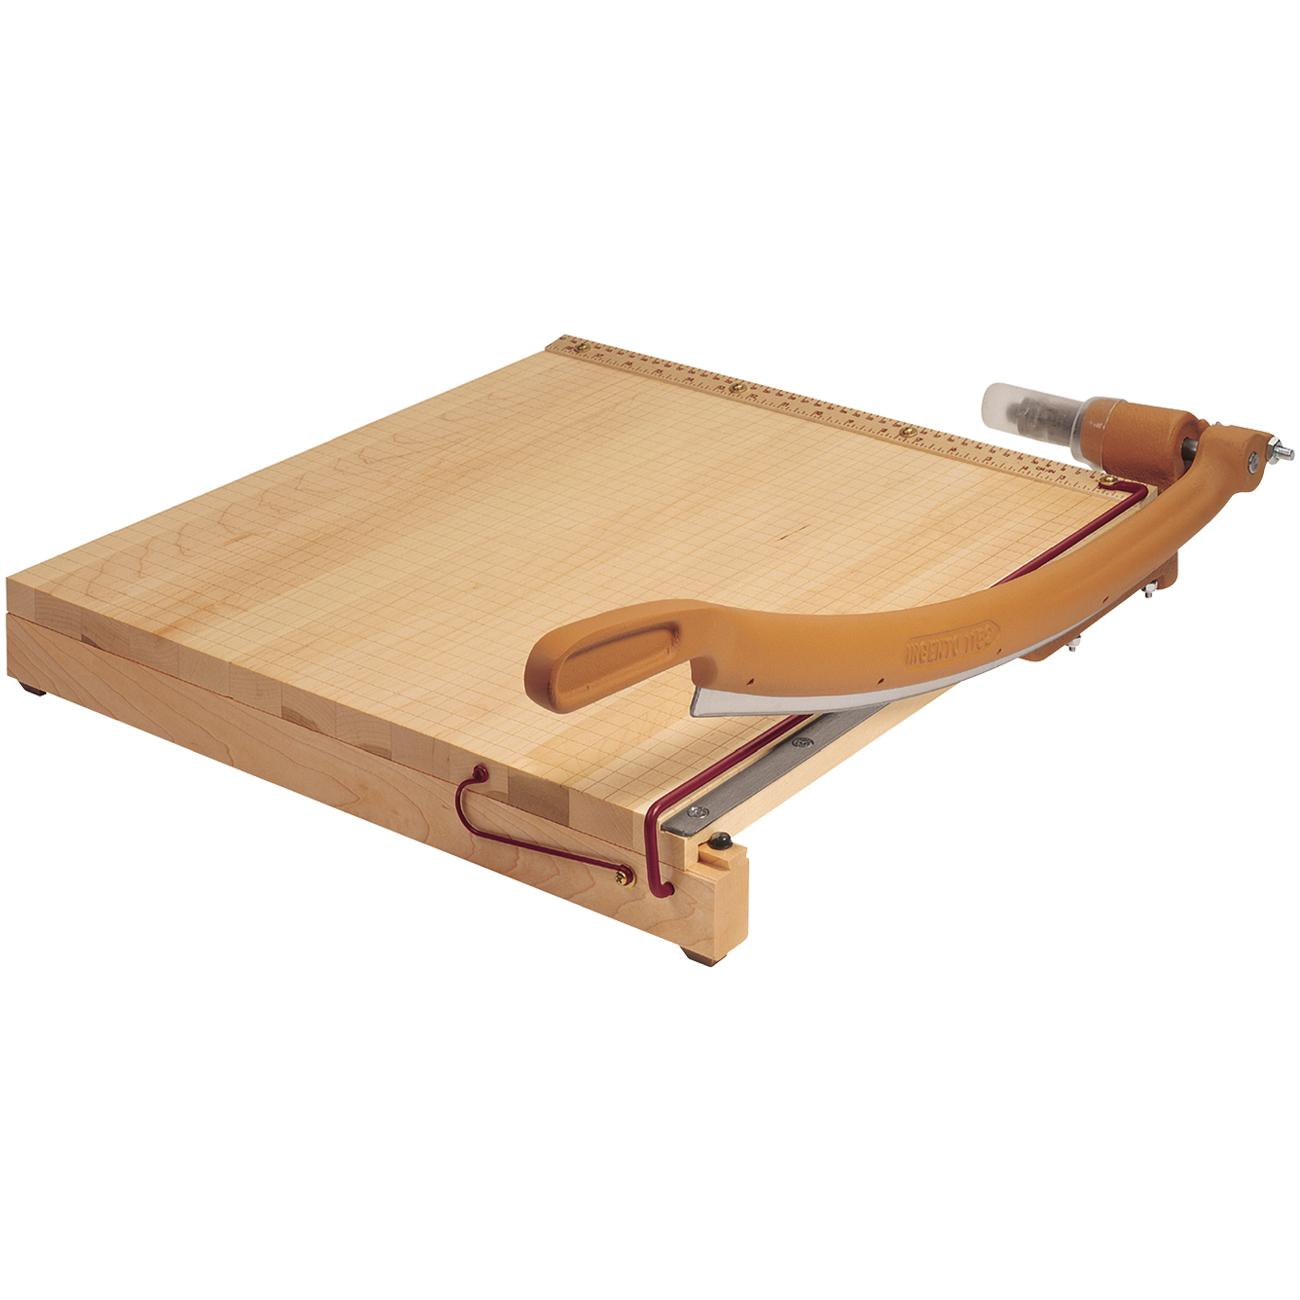 "Amazon.com : Swingline Paper Trimmer / Cutter, Guillotine, 18"" Cut"